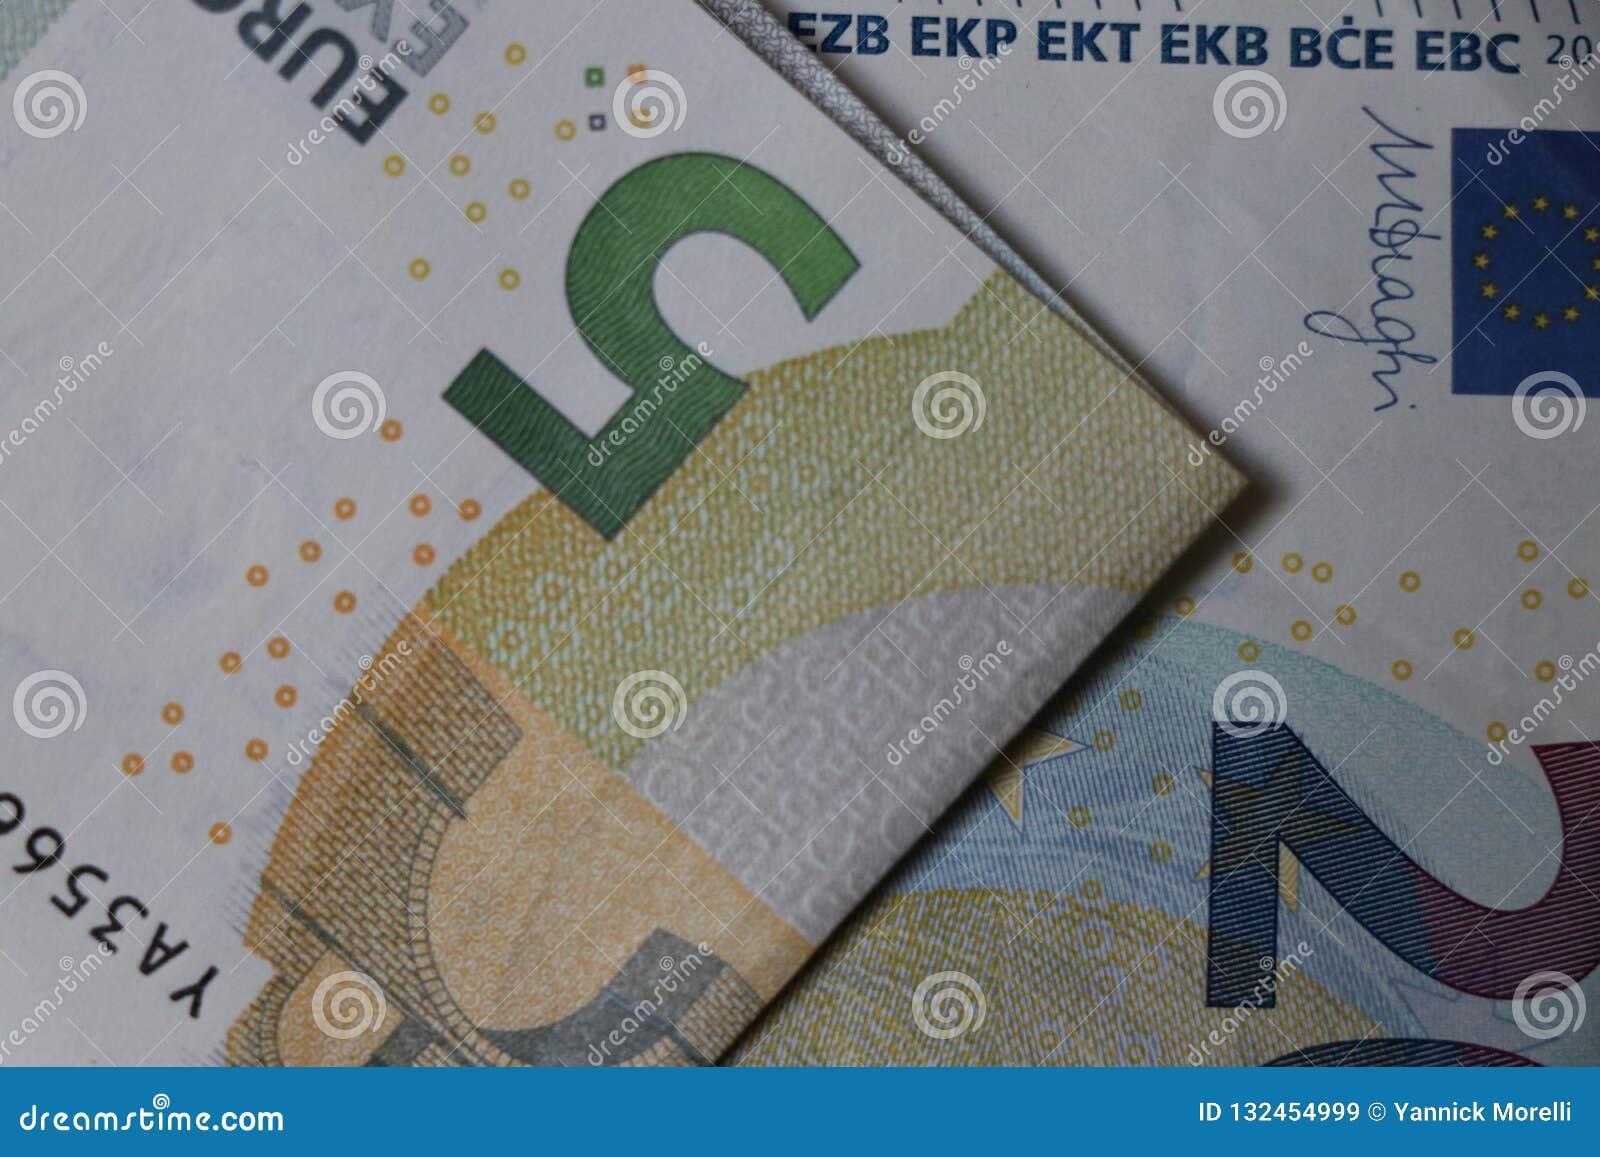 Bankbiljettenmunt van de Europese Unie